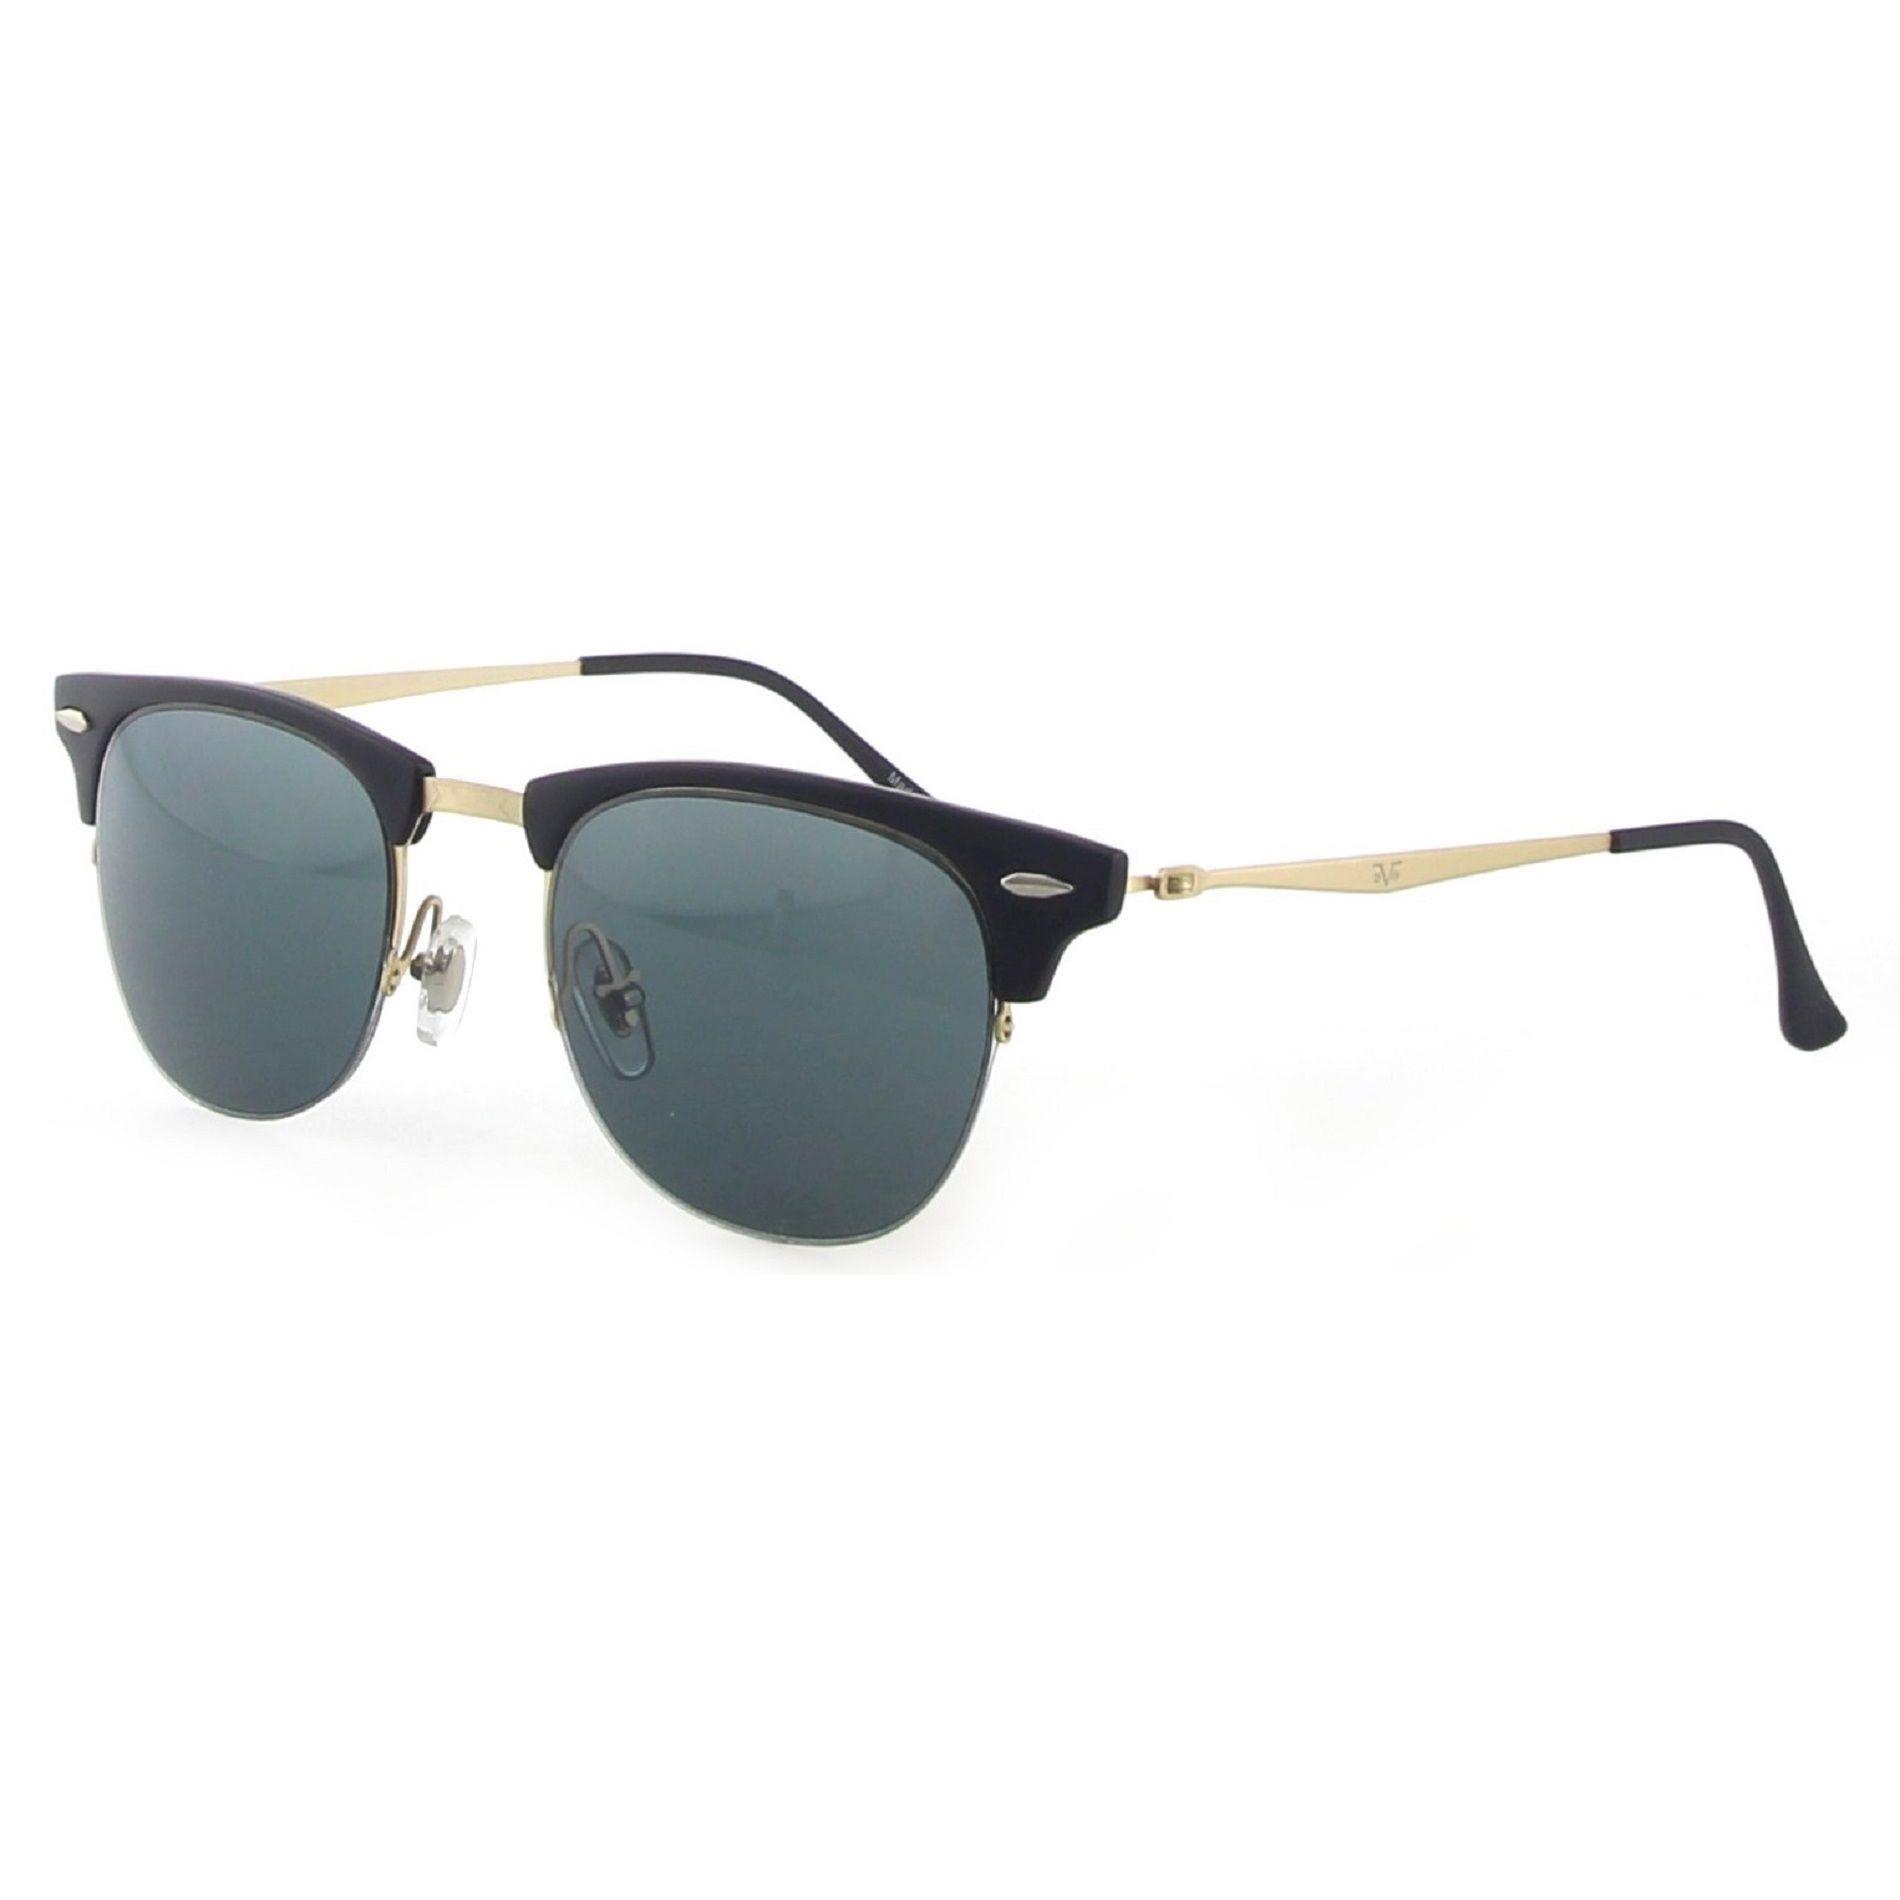 6fbc51d7677ef Versace 19V69 LLV2001T C1   Gold Oval Sunglasses